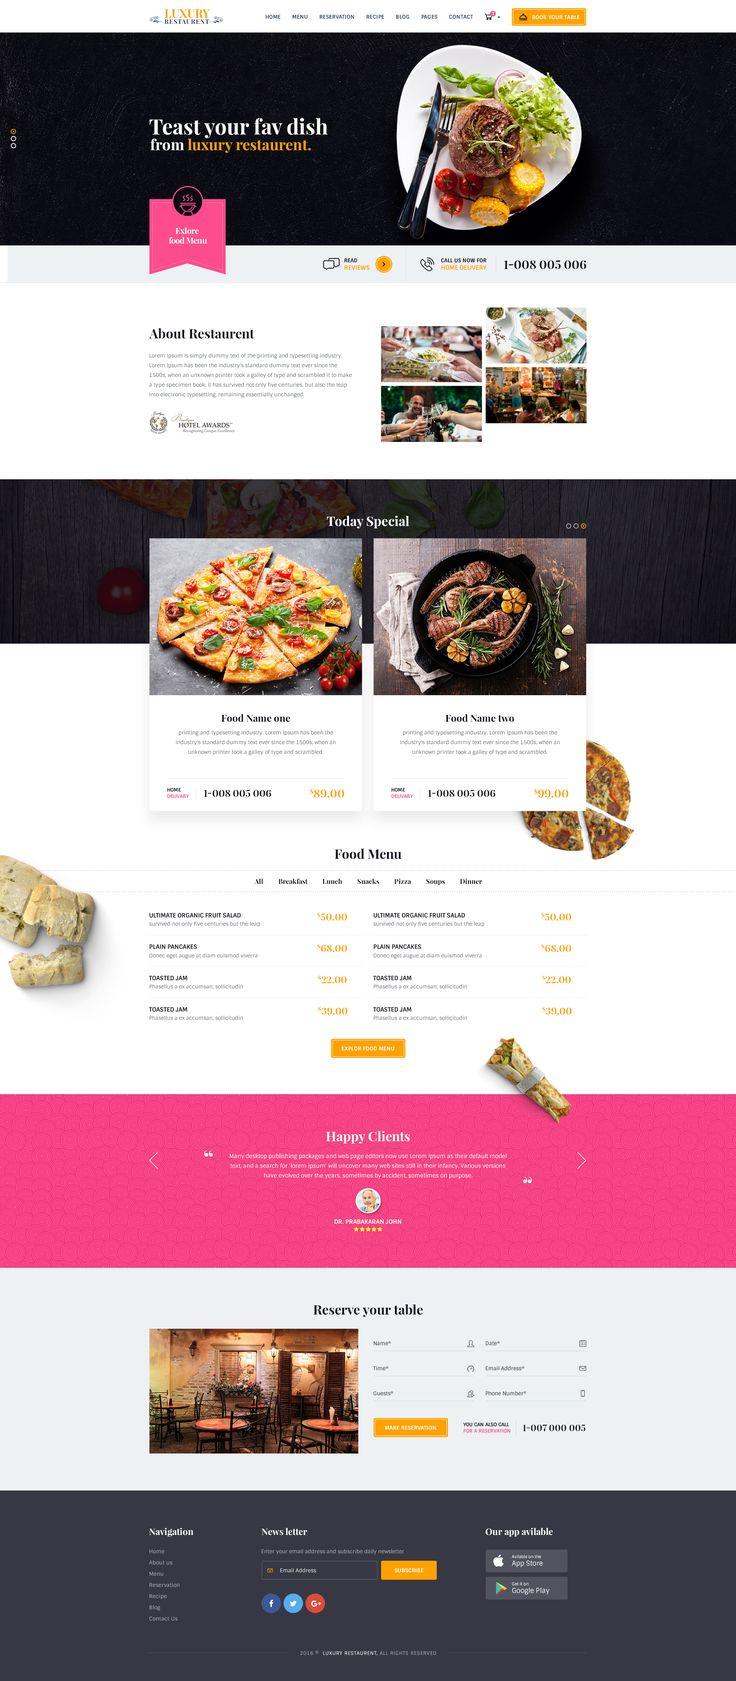 Restaurant : luxury restaurant #psd #burger #cafe • Download ➝ https://themeforest.net/item/restaurant-luxury-restaurant/18896323?ref=pxcr